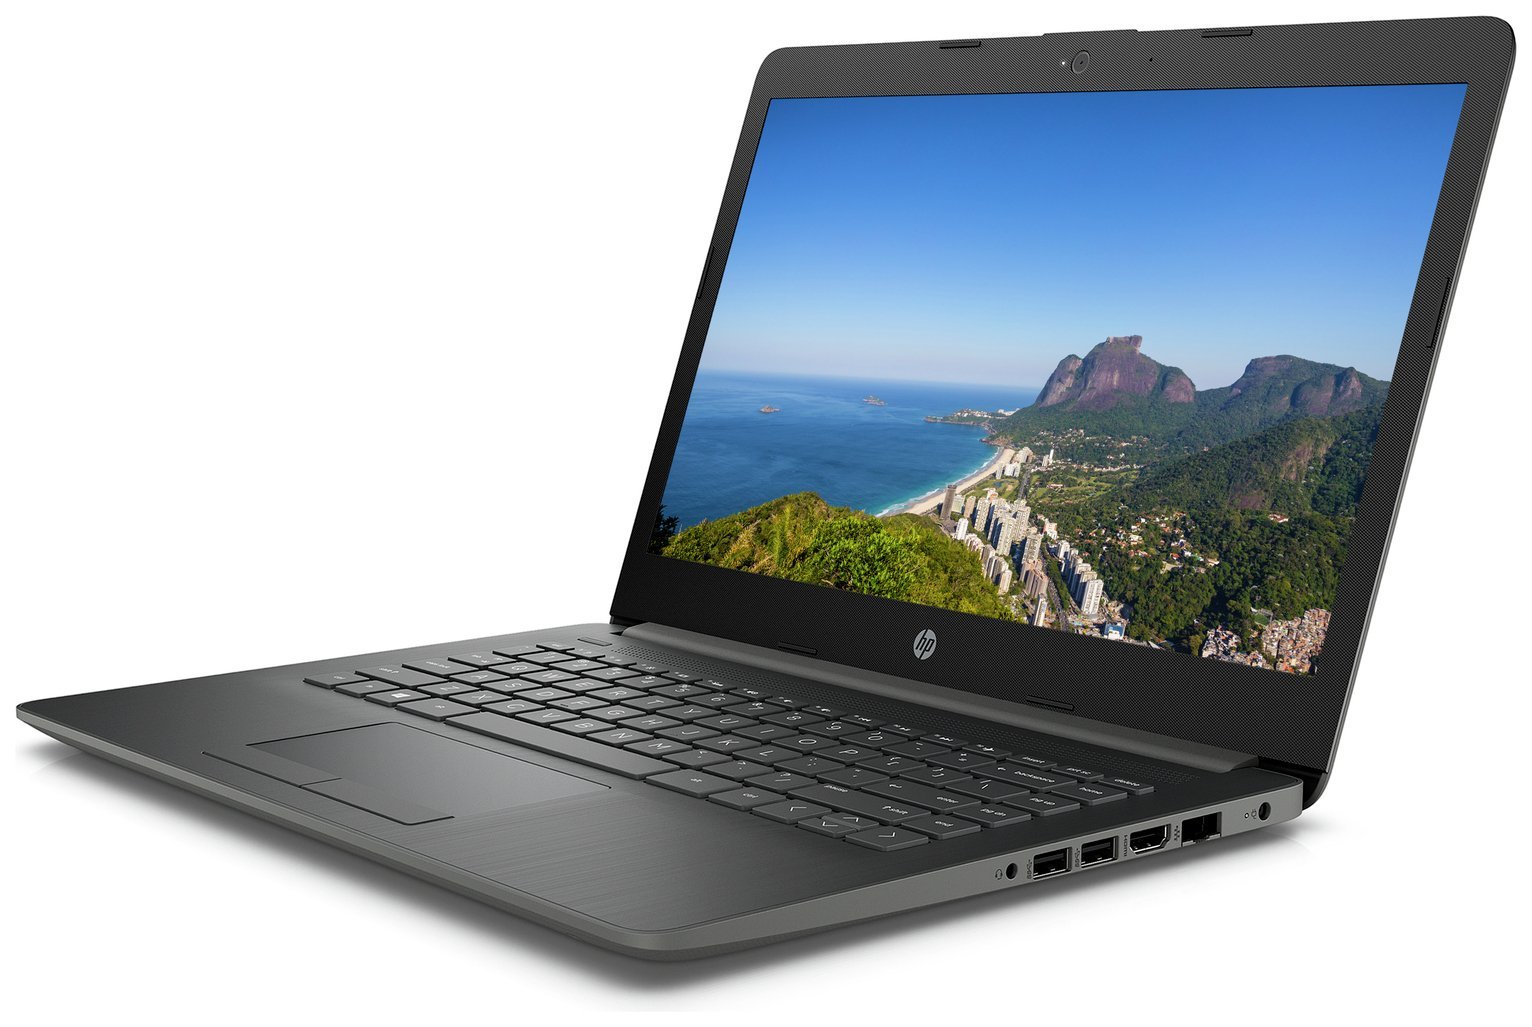 HP 14 Inch Intel Core i3 4GB 128GB SSD HD Laptop - Grey